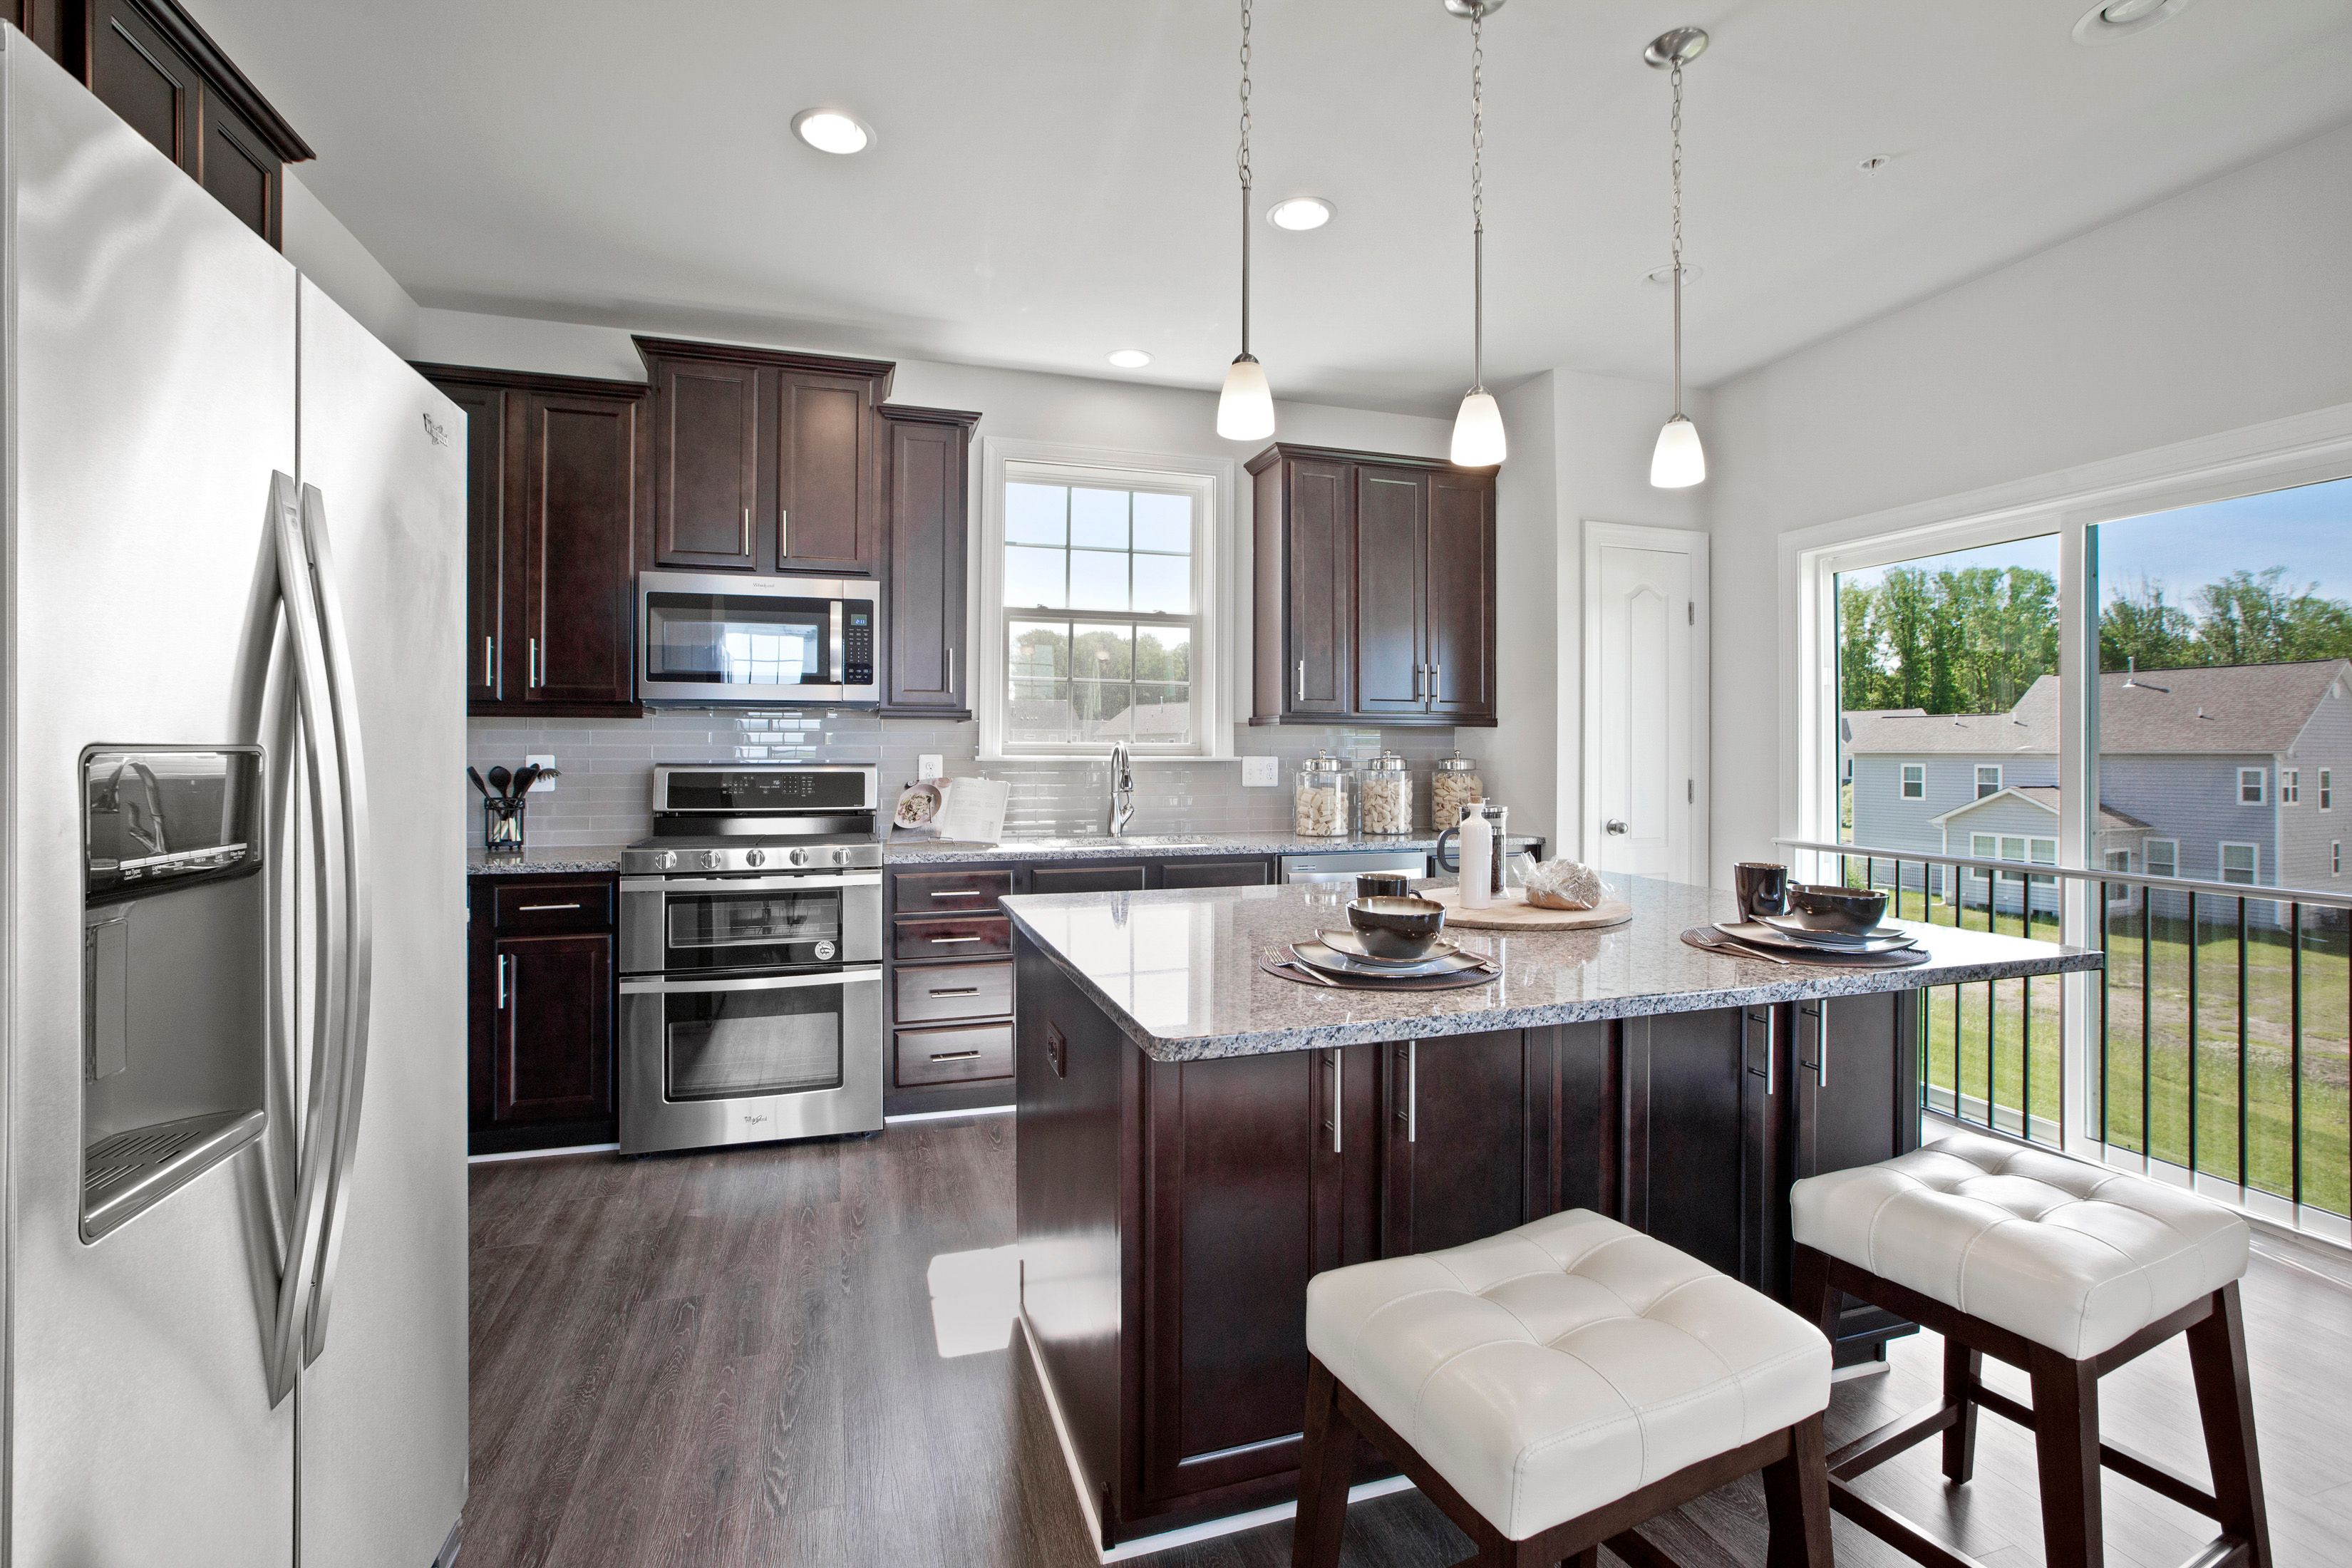 Kitchen featured in the Newbury II By Dan Ryan Builders in Hagerstown, MD